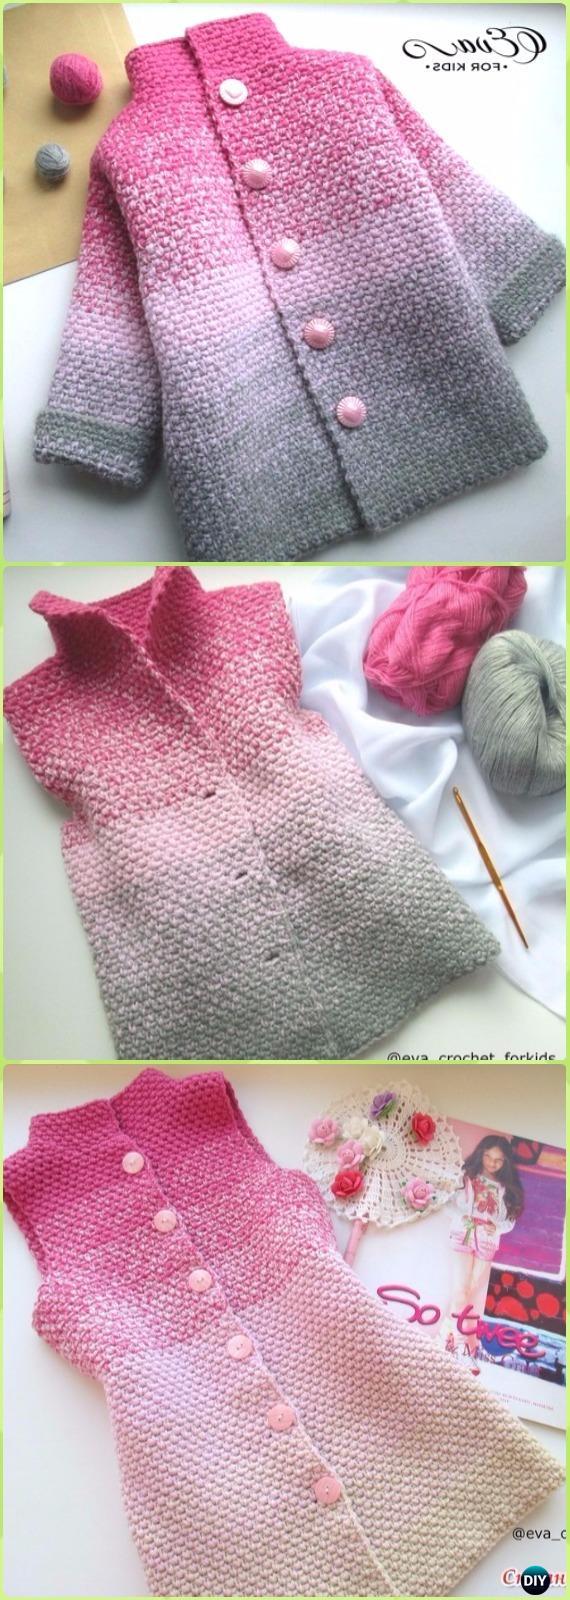 fb1170b6cb8e Crochet Kids Sweater Coat Free Patterns